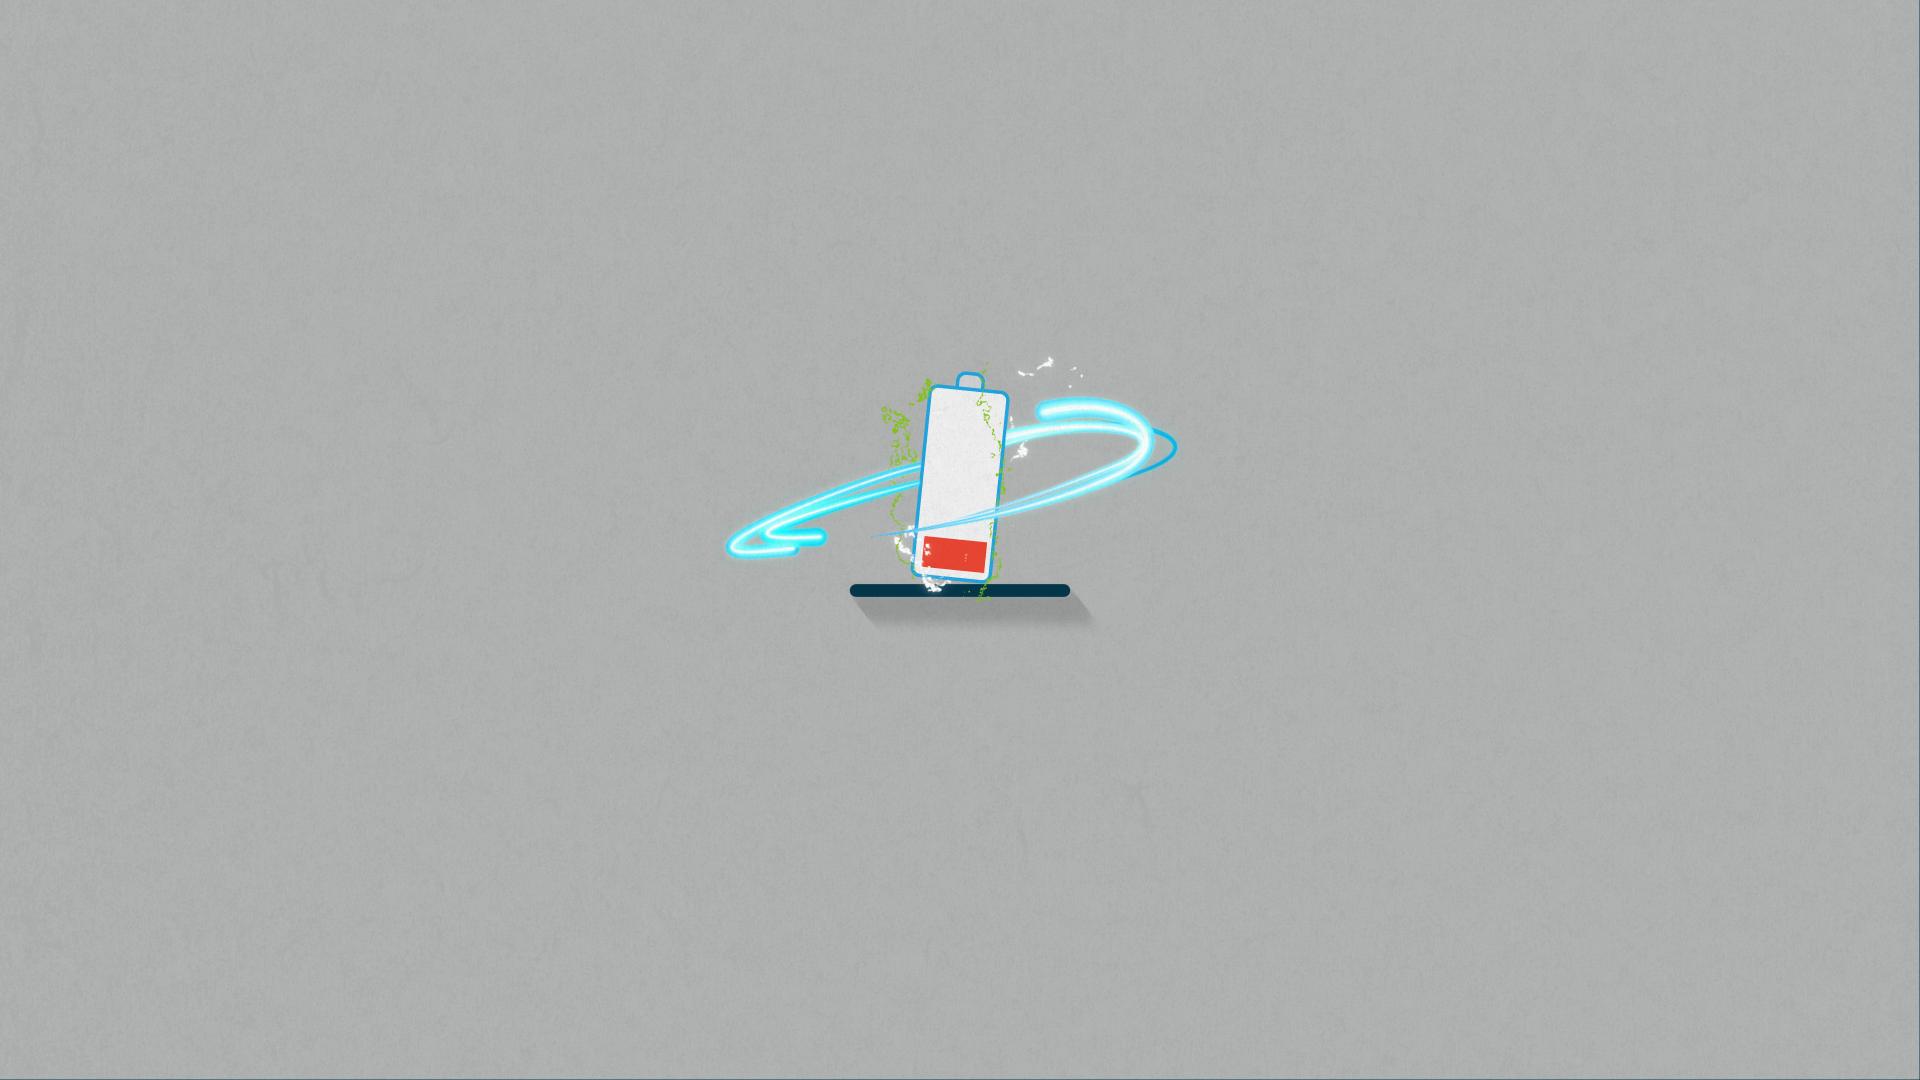 Energizer_Battery_5.8.2015_00928